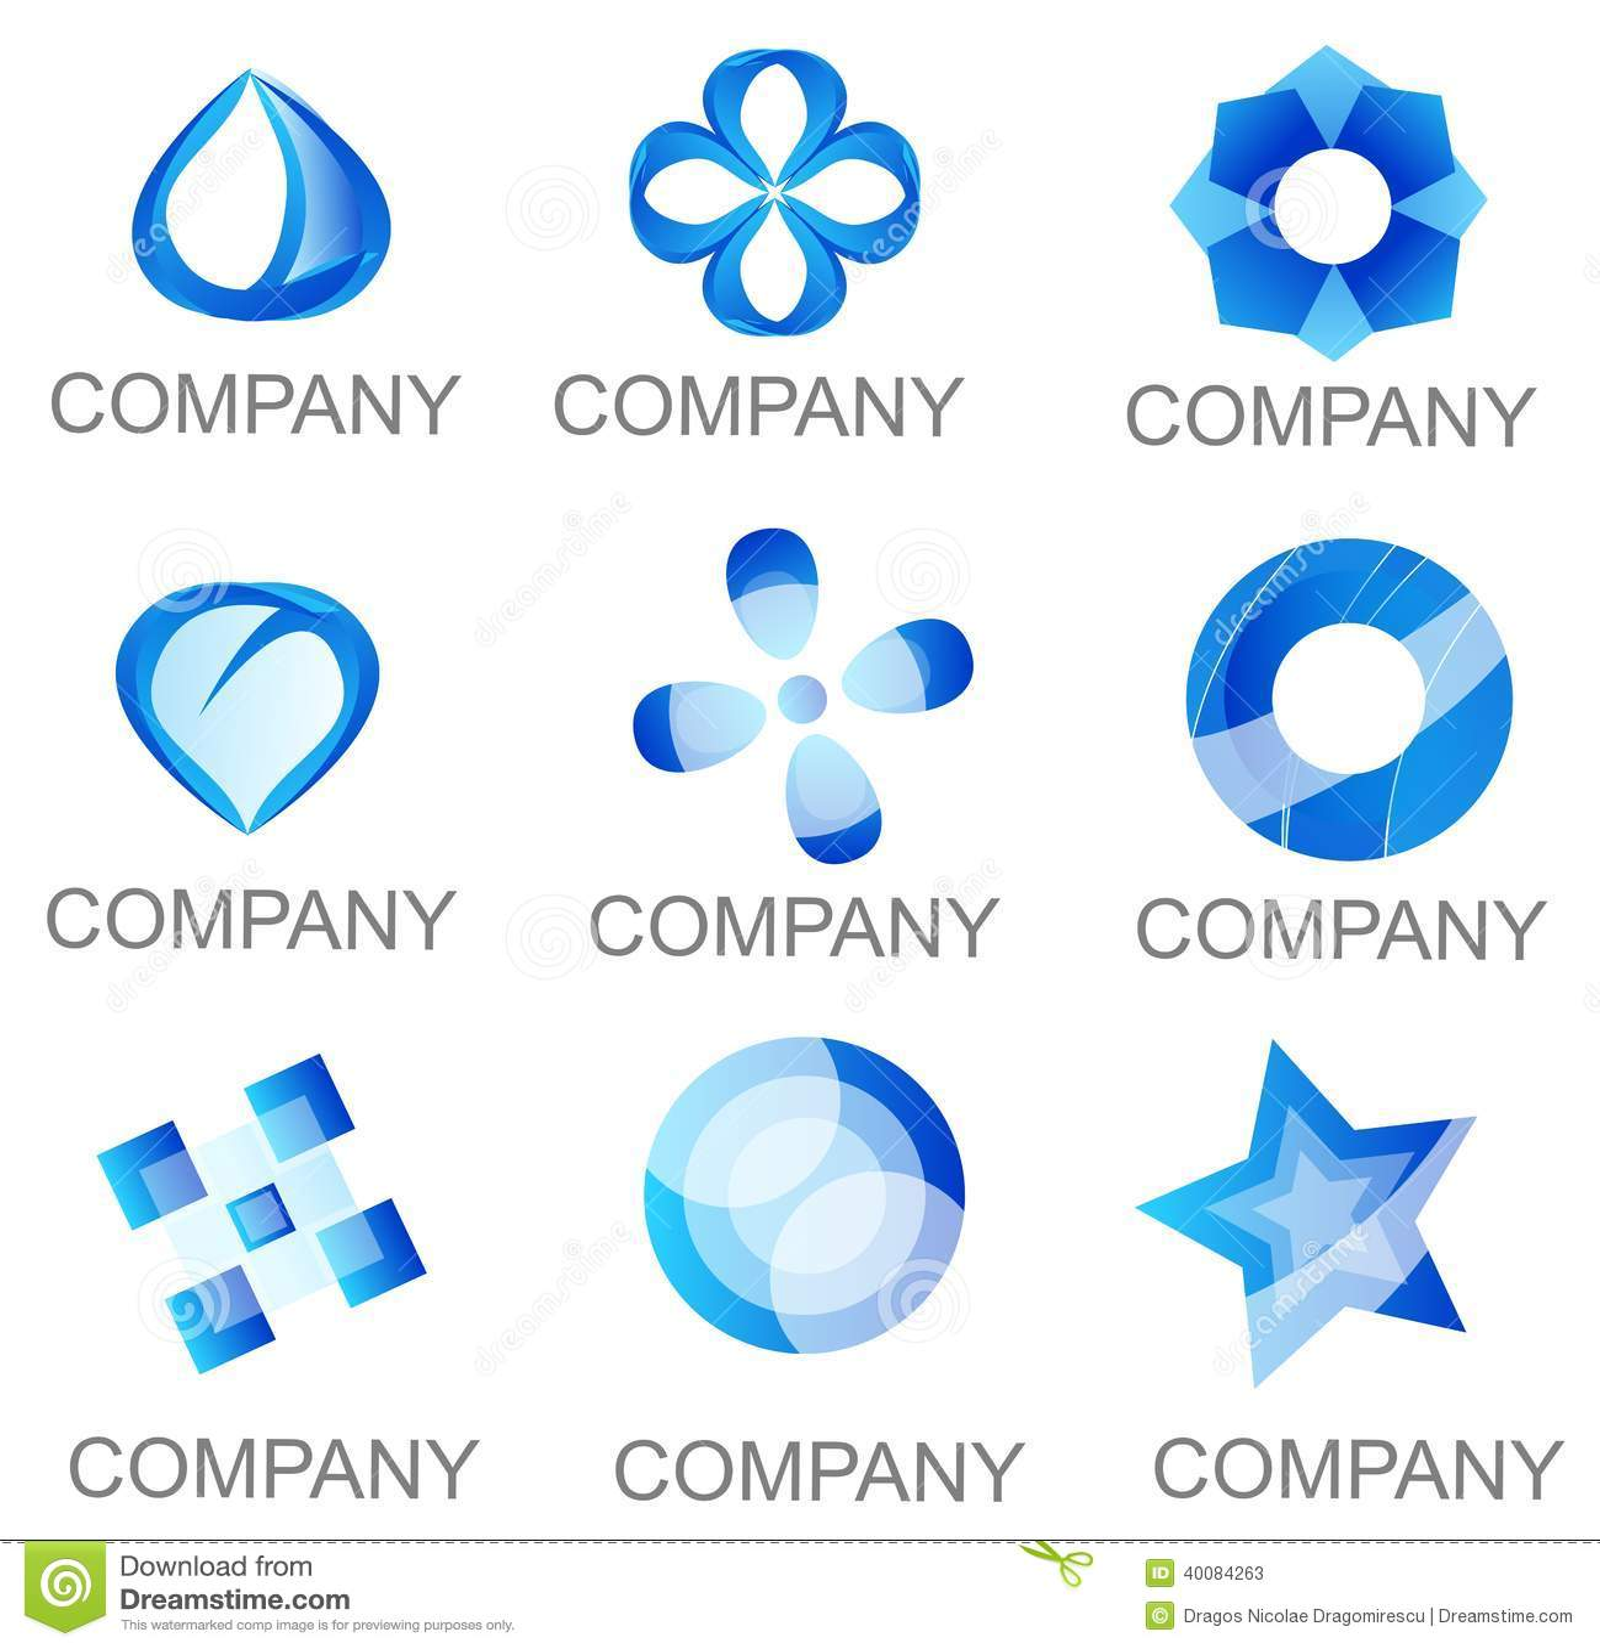 abstract blue company logo set icons stock illustration